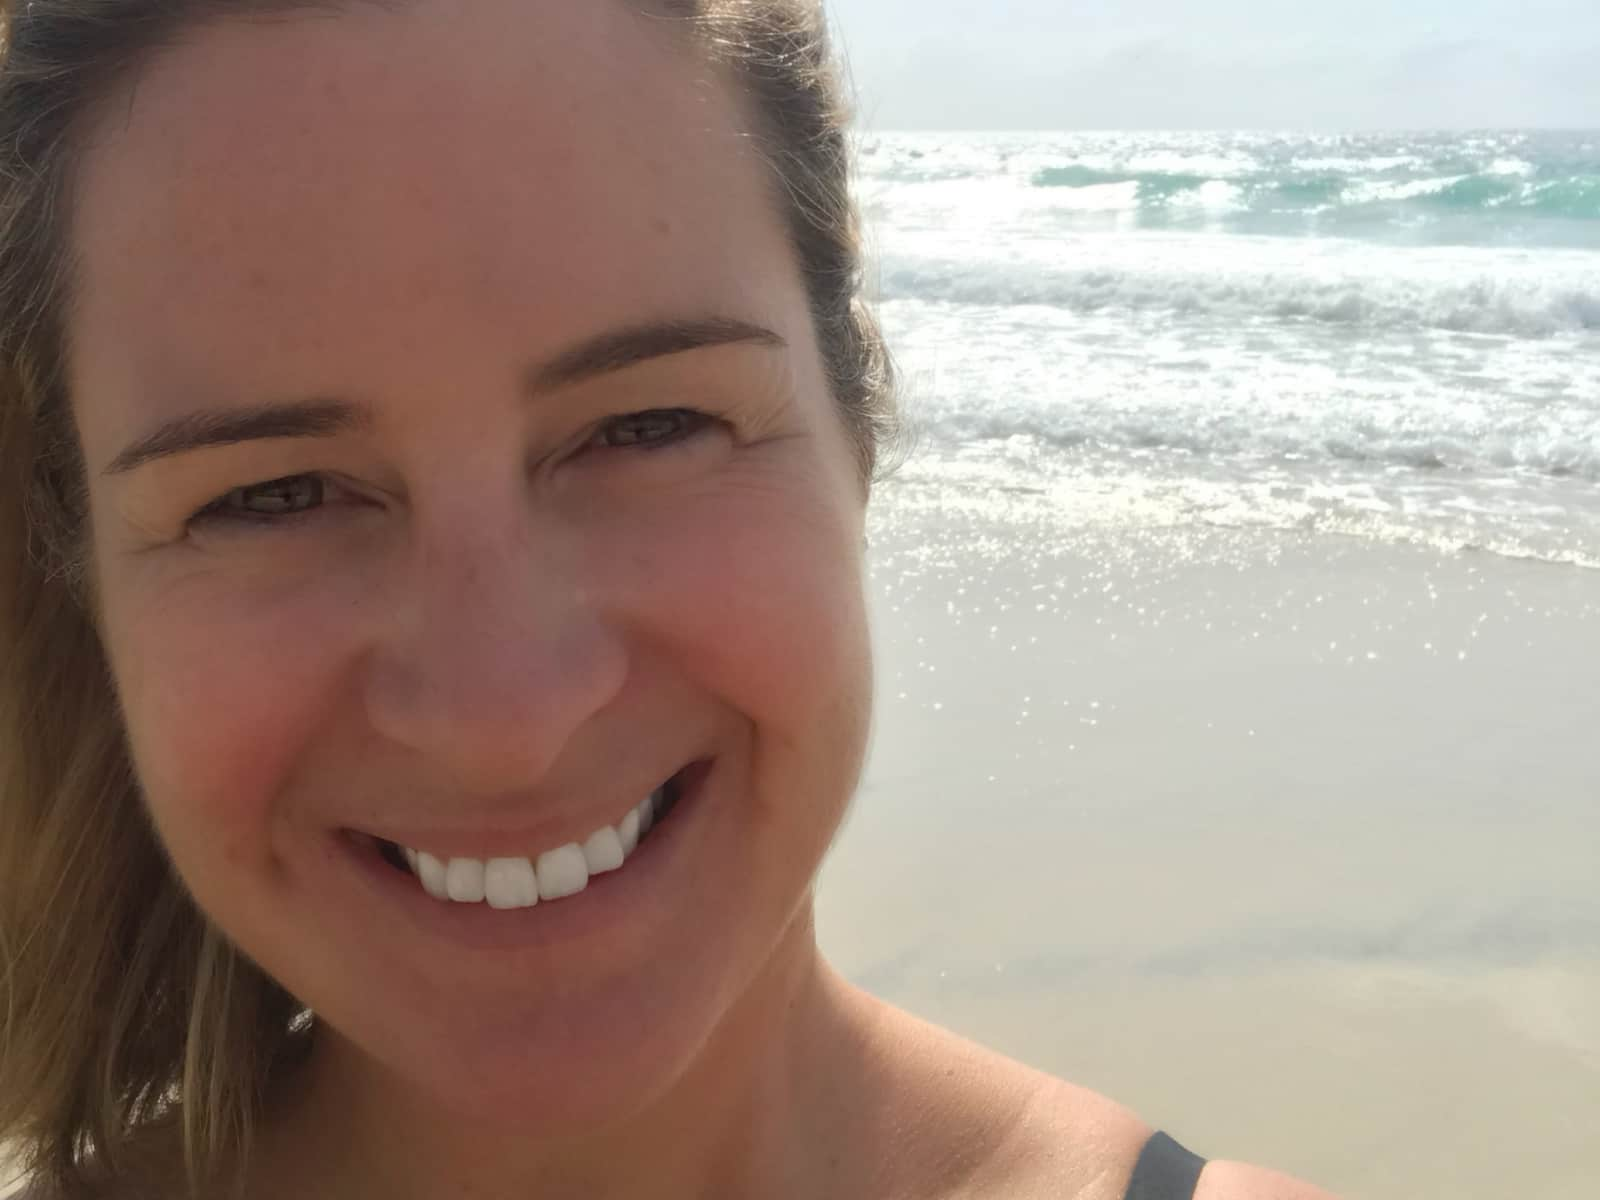 Alexandra from Brisbane, Queensland, Australia